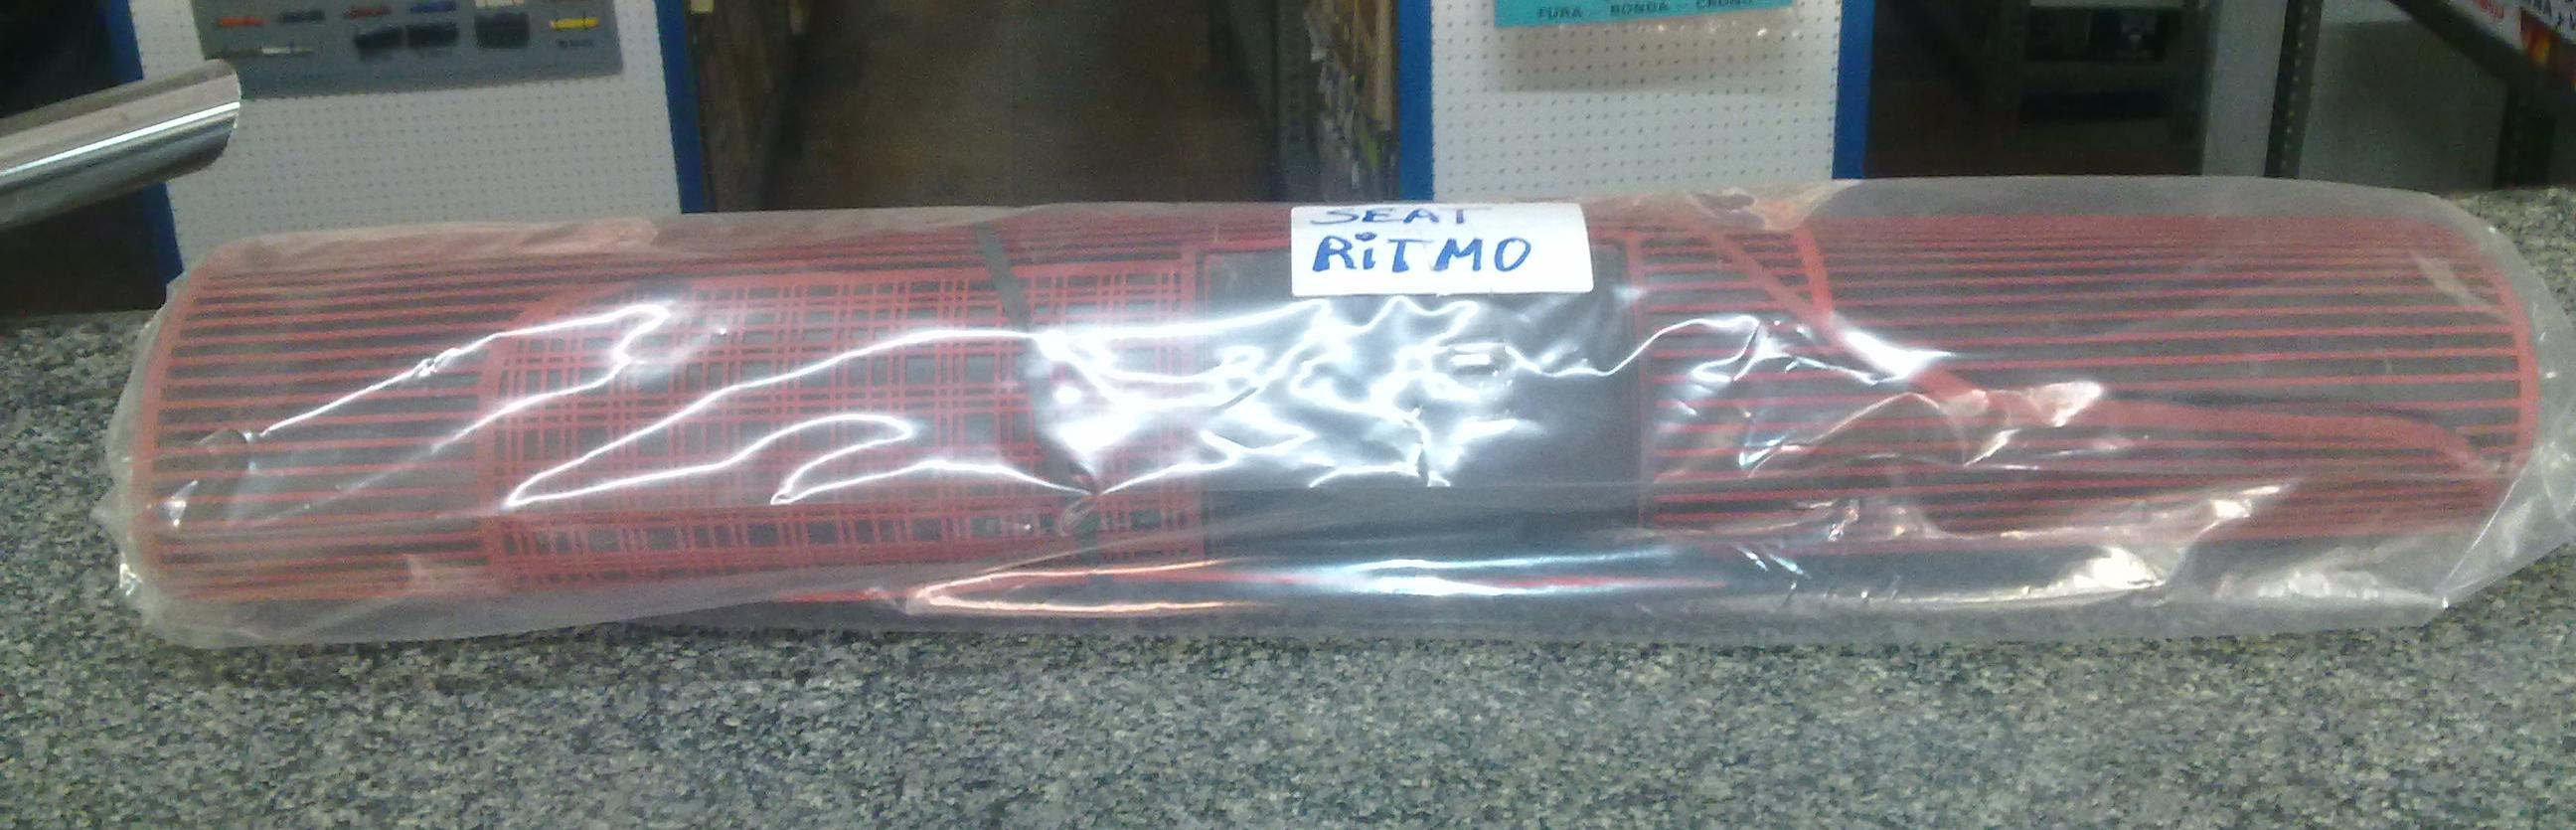 Alfombras originales seat ritmo cat logo de productos de - Alfombras originales ...